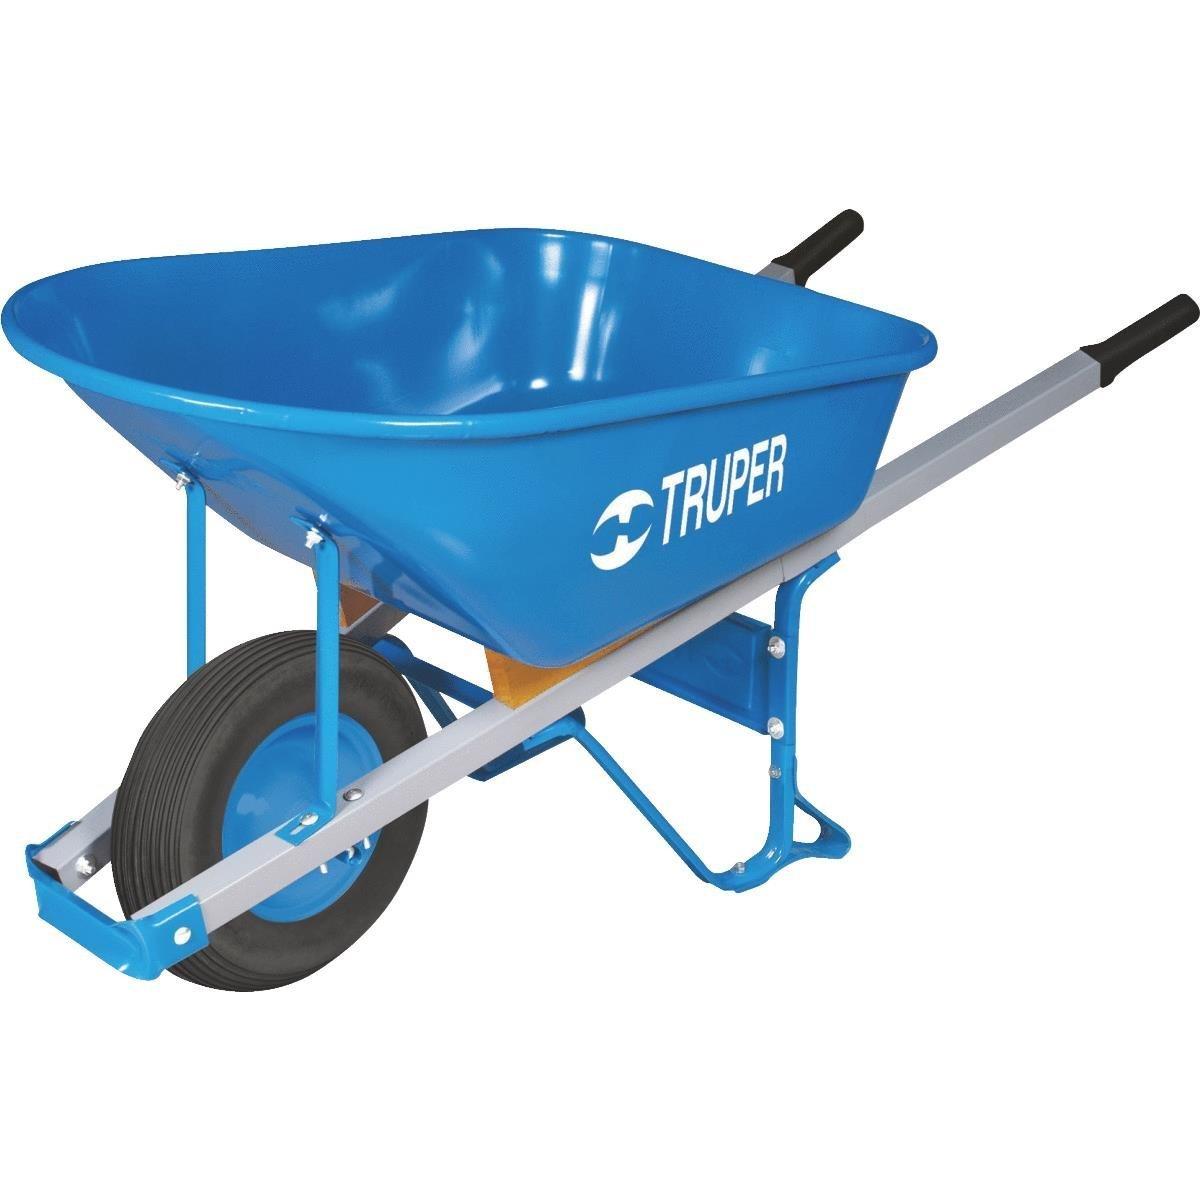 truper tru wheelbarrow